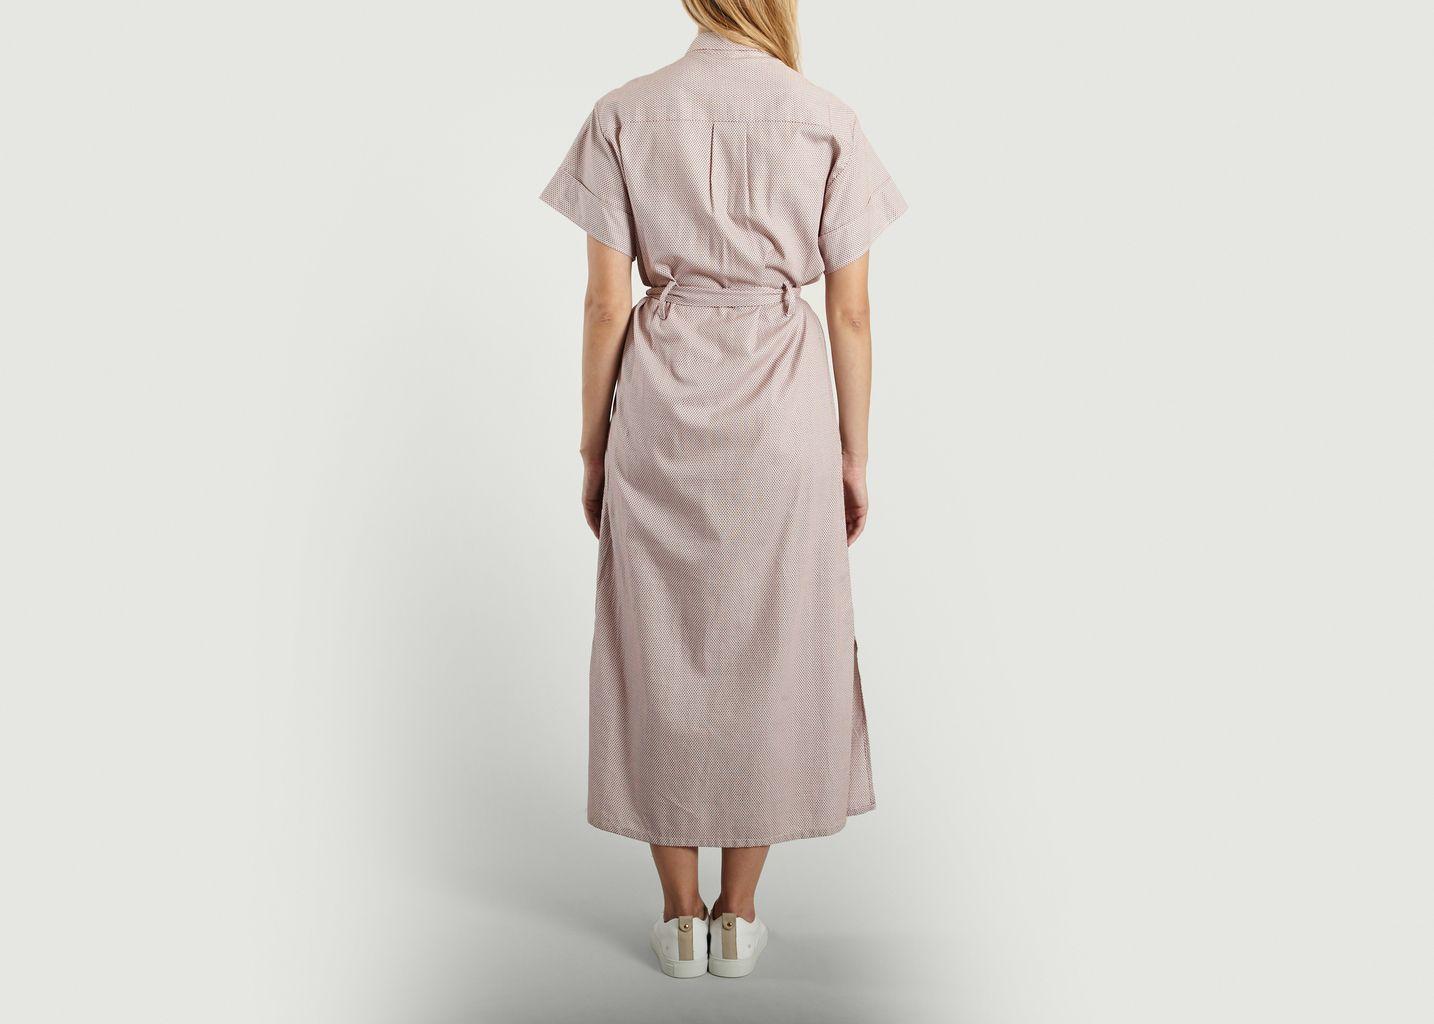 Robe Longue  Isabella - Maison Kitsuné